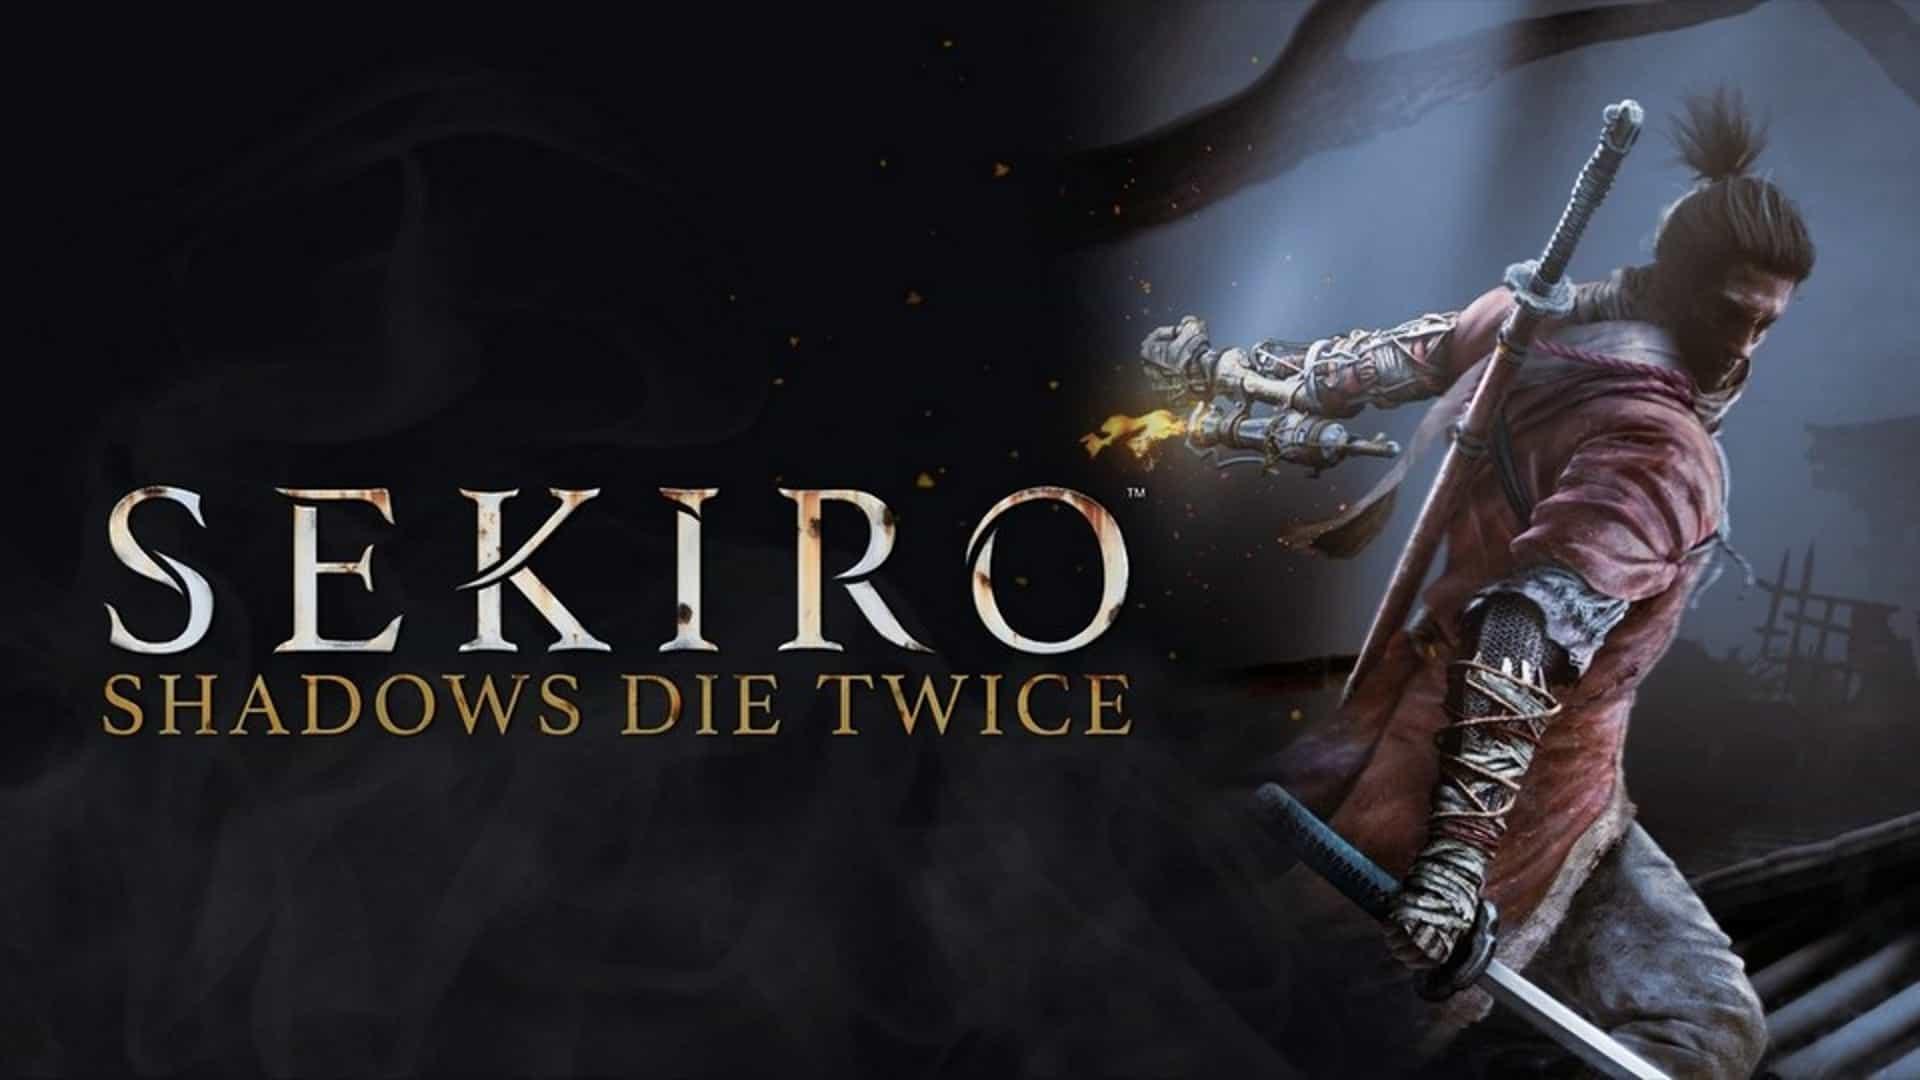 TRAILER: Sekiro: Shadows Die Twice Launch Trailer